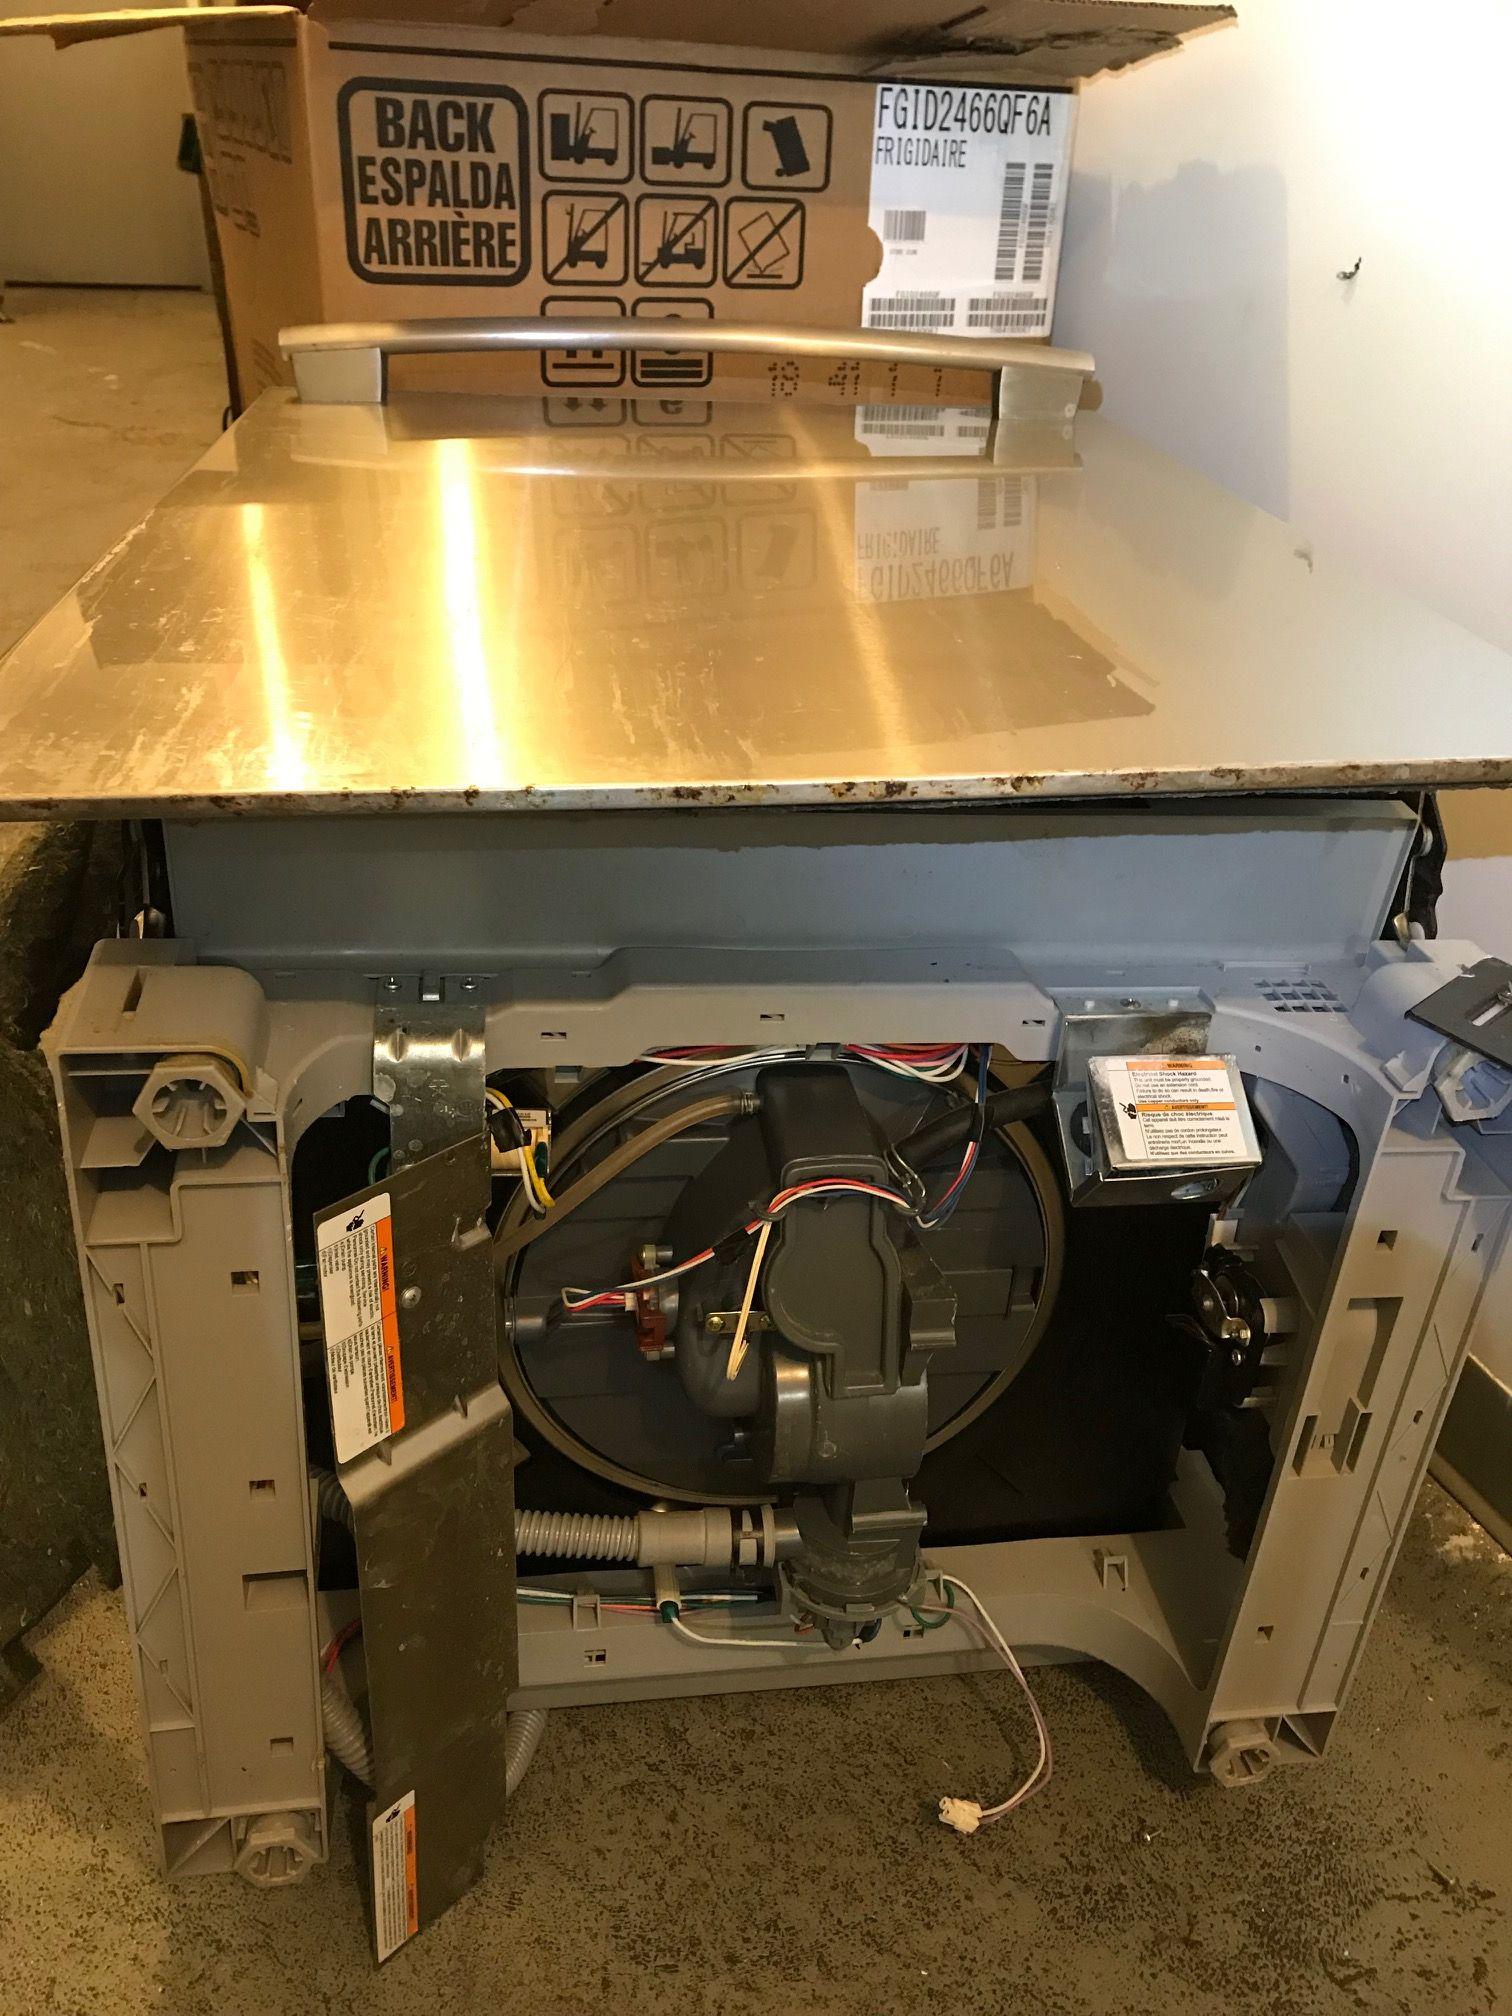 Frigidaire Dishwasher Repair Dishwasher Repair Appliance Repair Frigidaire Dishwasher